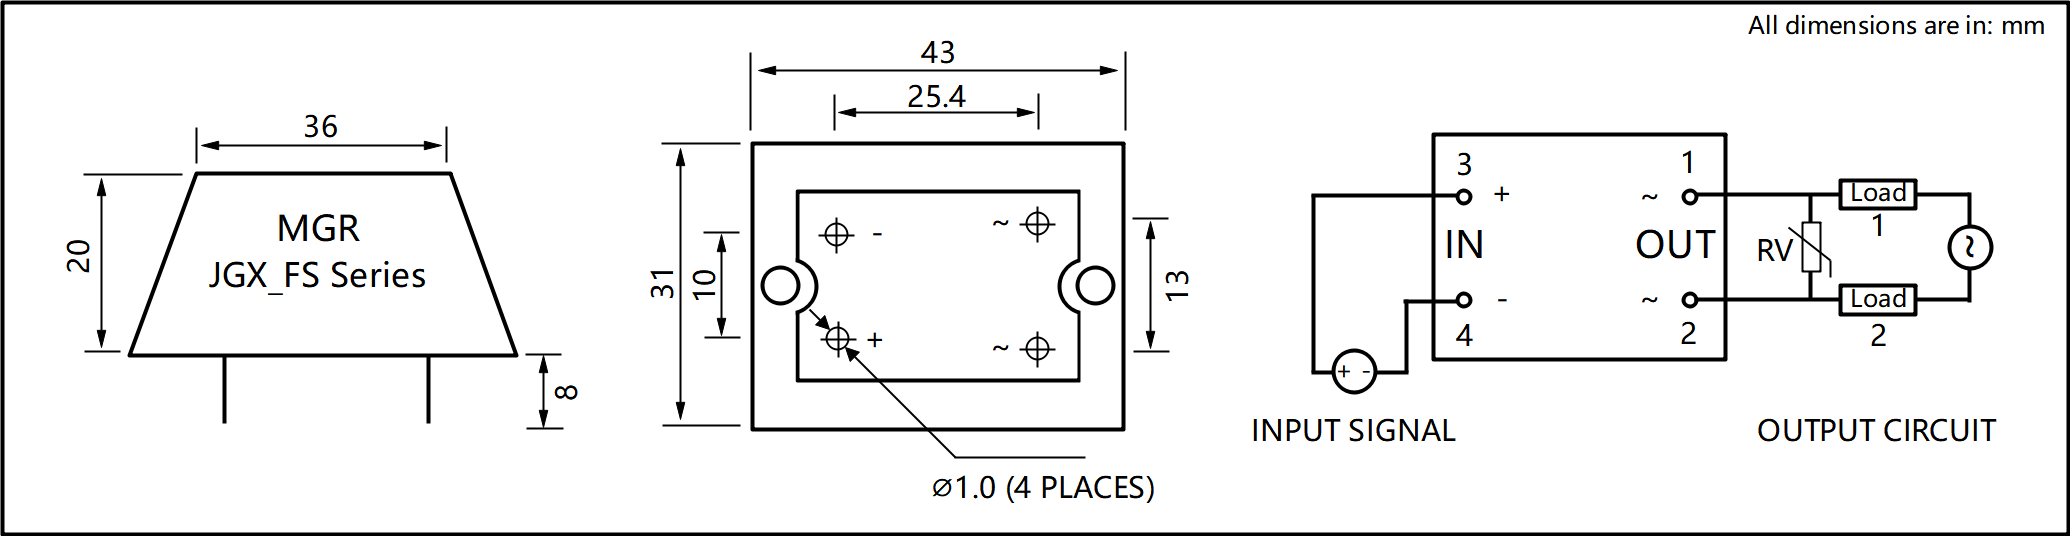 JGX_F Series Cast Aluminum-zinc Alloy Housing PCB Mount Solid State Relay Circuit Wring Diagram